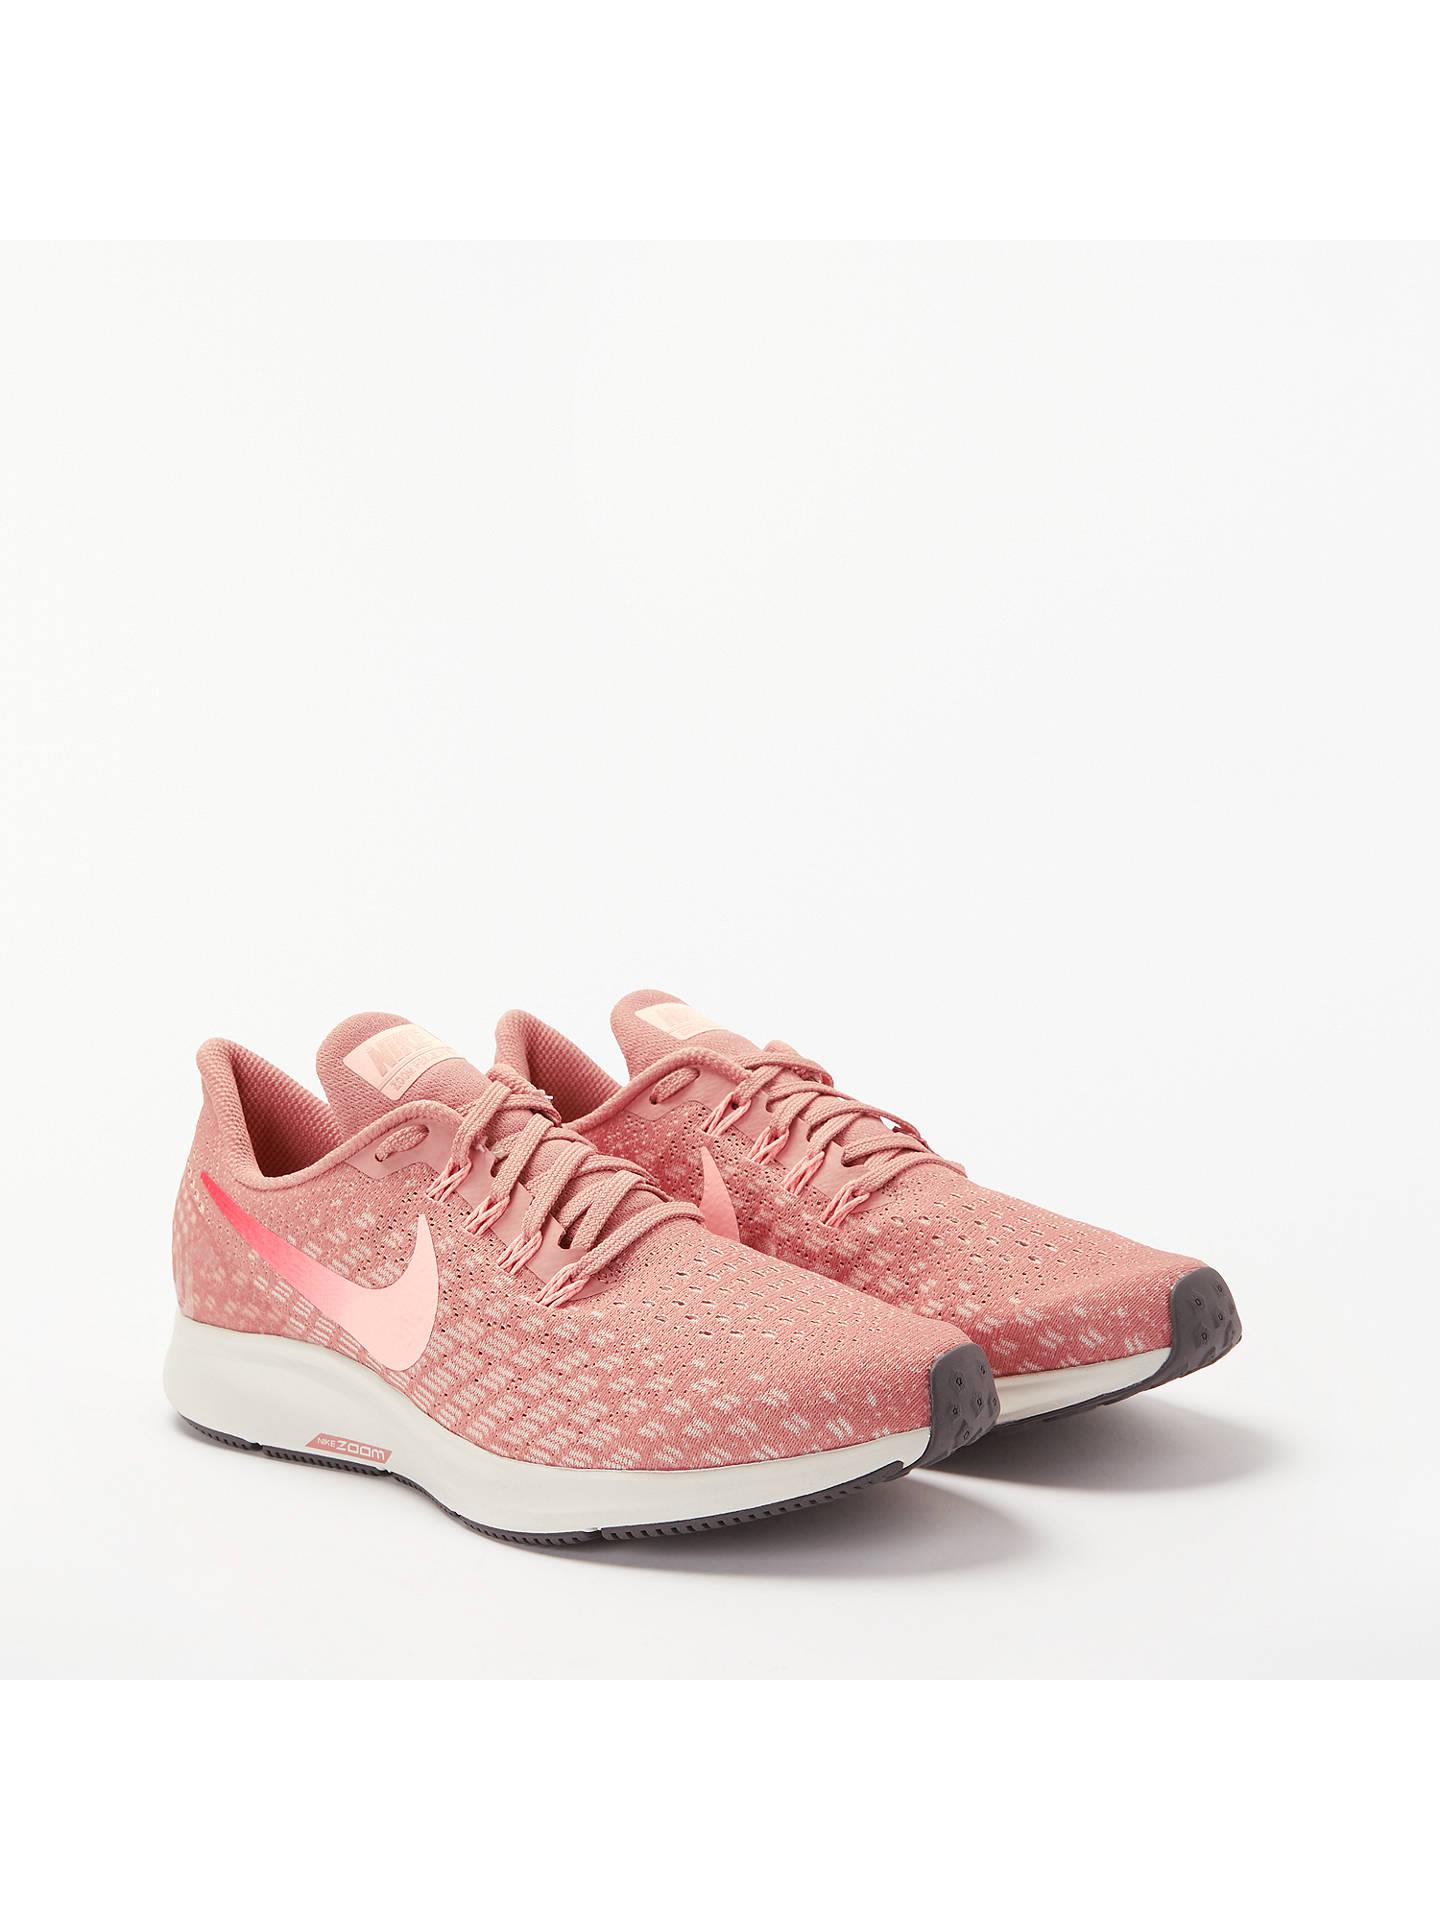 wholesale dealer 23440 0d0d9 Nike Air Zoom Pegasus 35 Women's Running Shoes at John Lewis ...